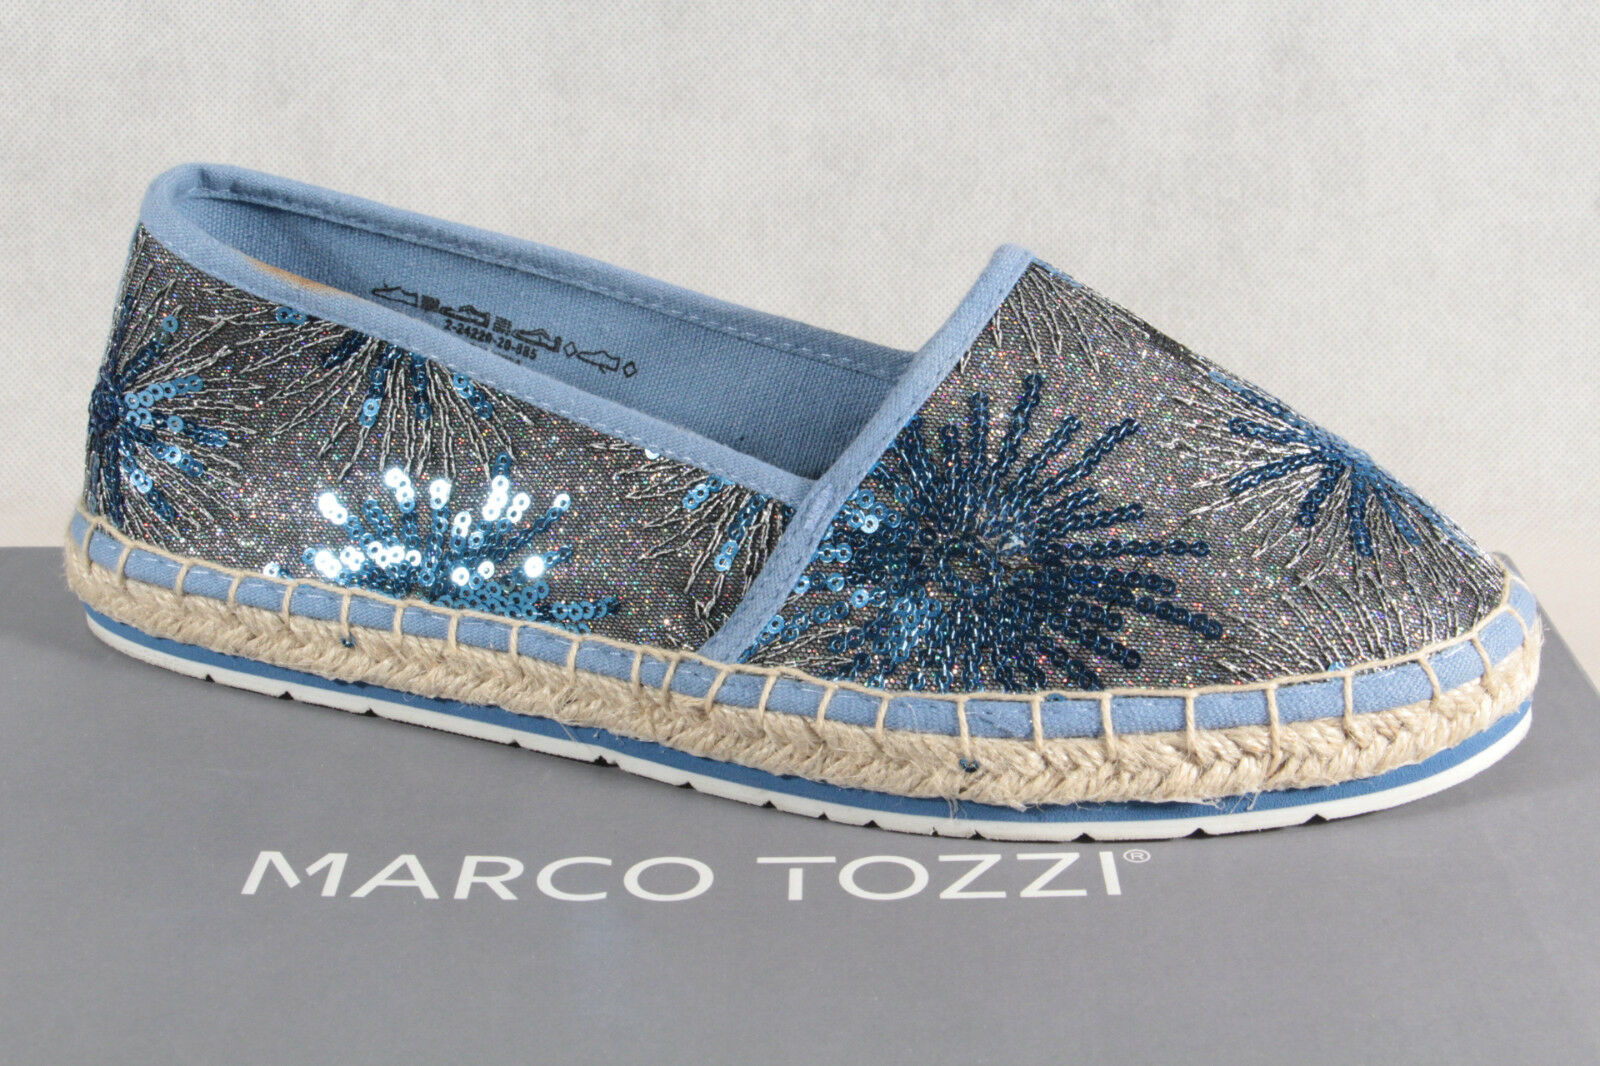 Marco Tozzi Women's Slip-Ons Ballerinas Textile bluee New